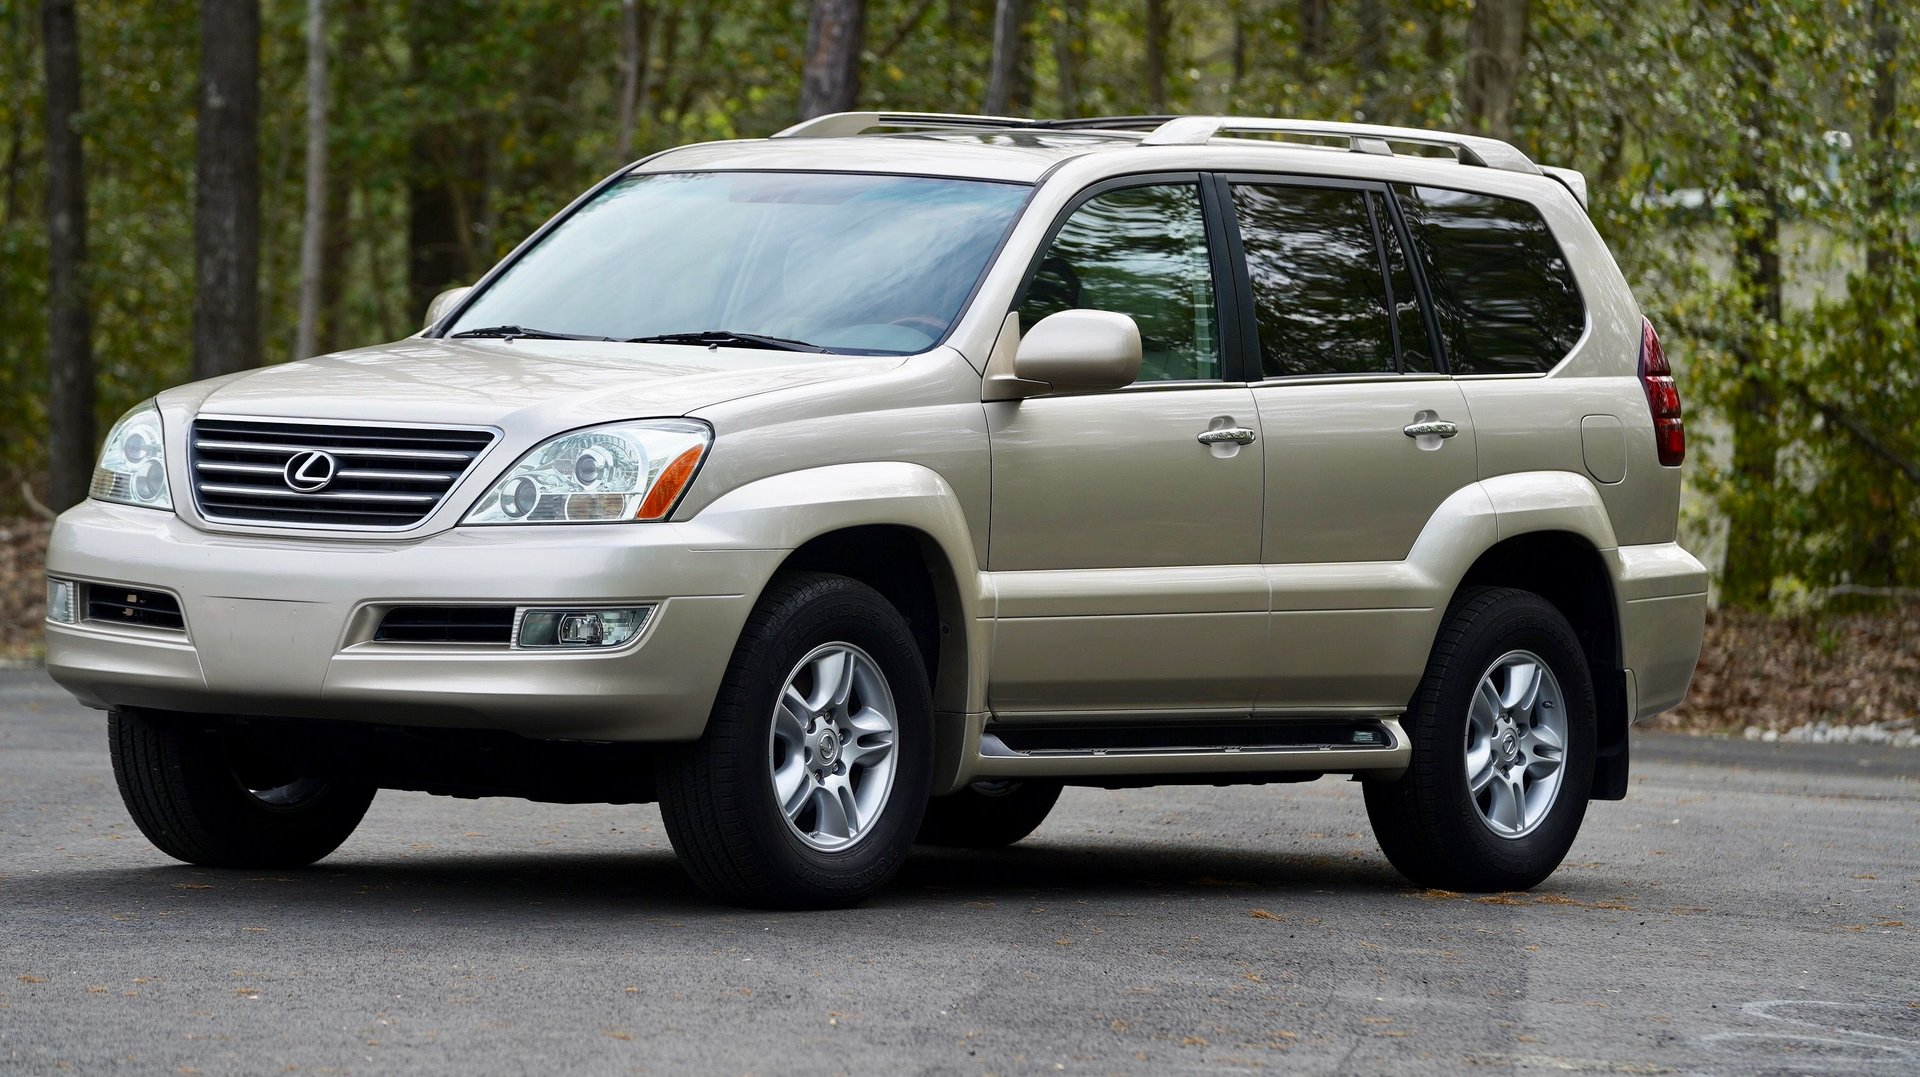 2008 lexus gx 470 4wd 4dr